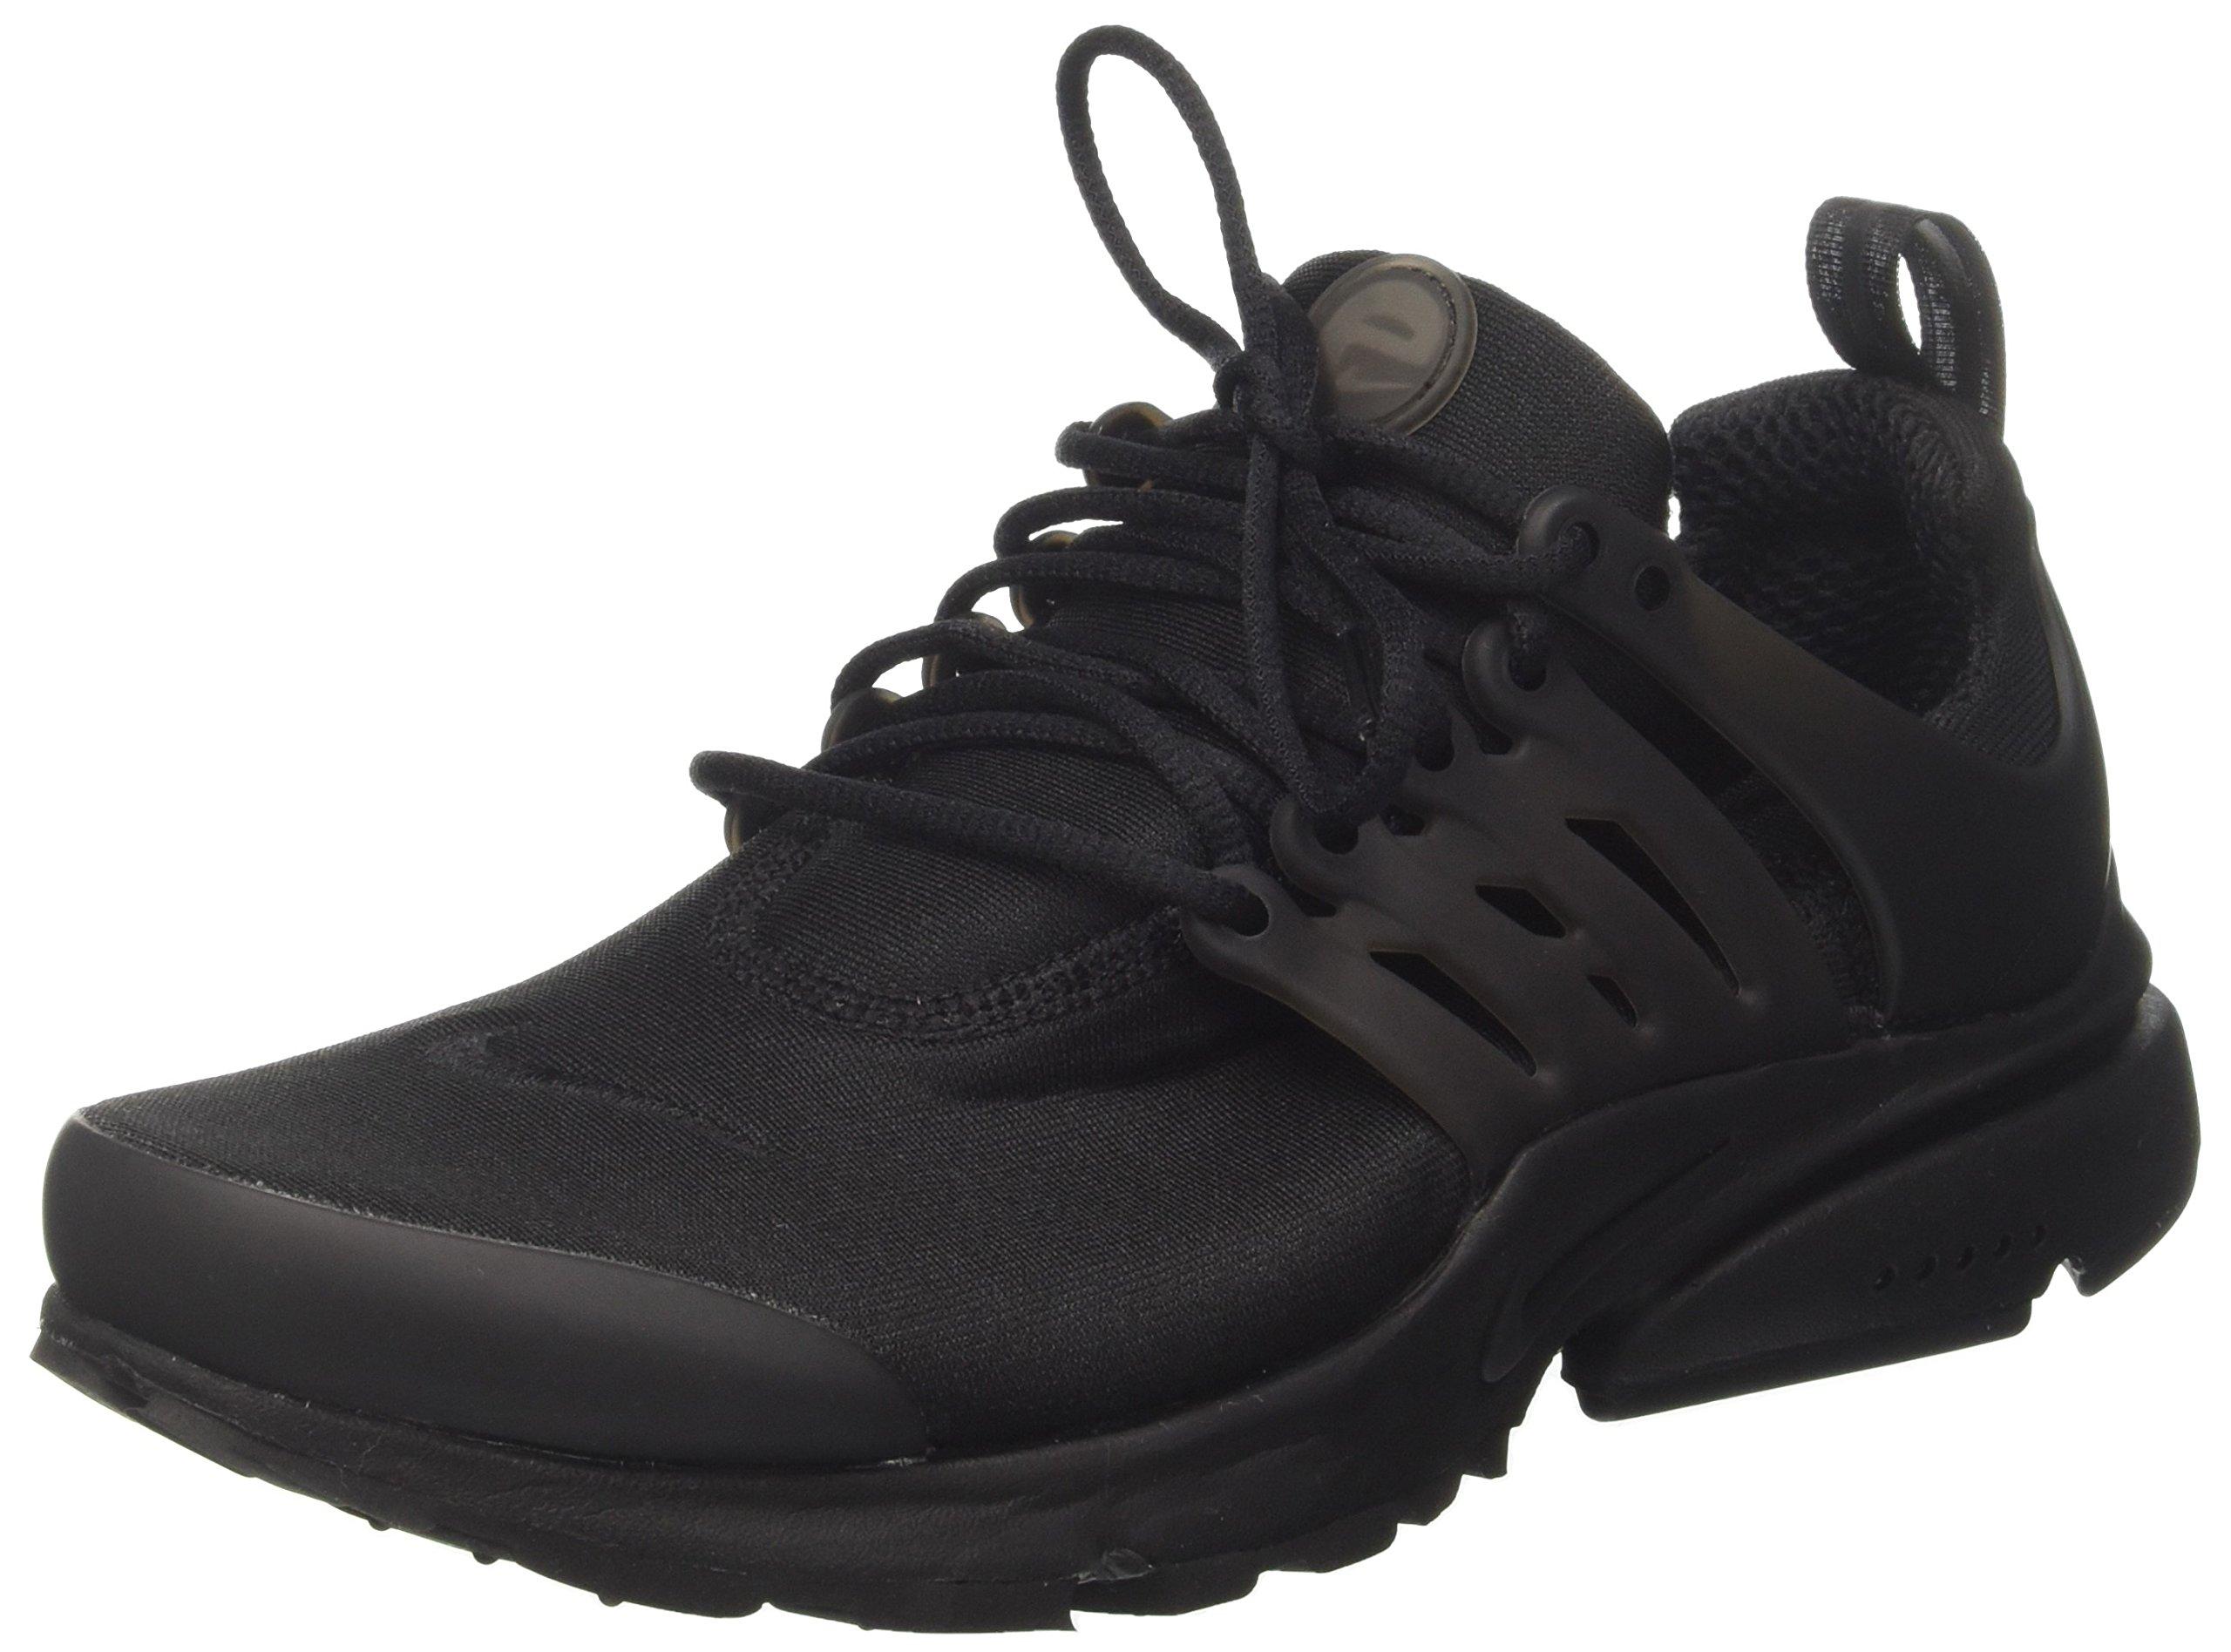 NIKE Air Presto Essential Mens Shoes Black/Black/Black 848187-011 (7 D(M) US)